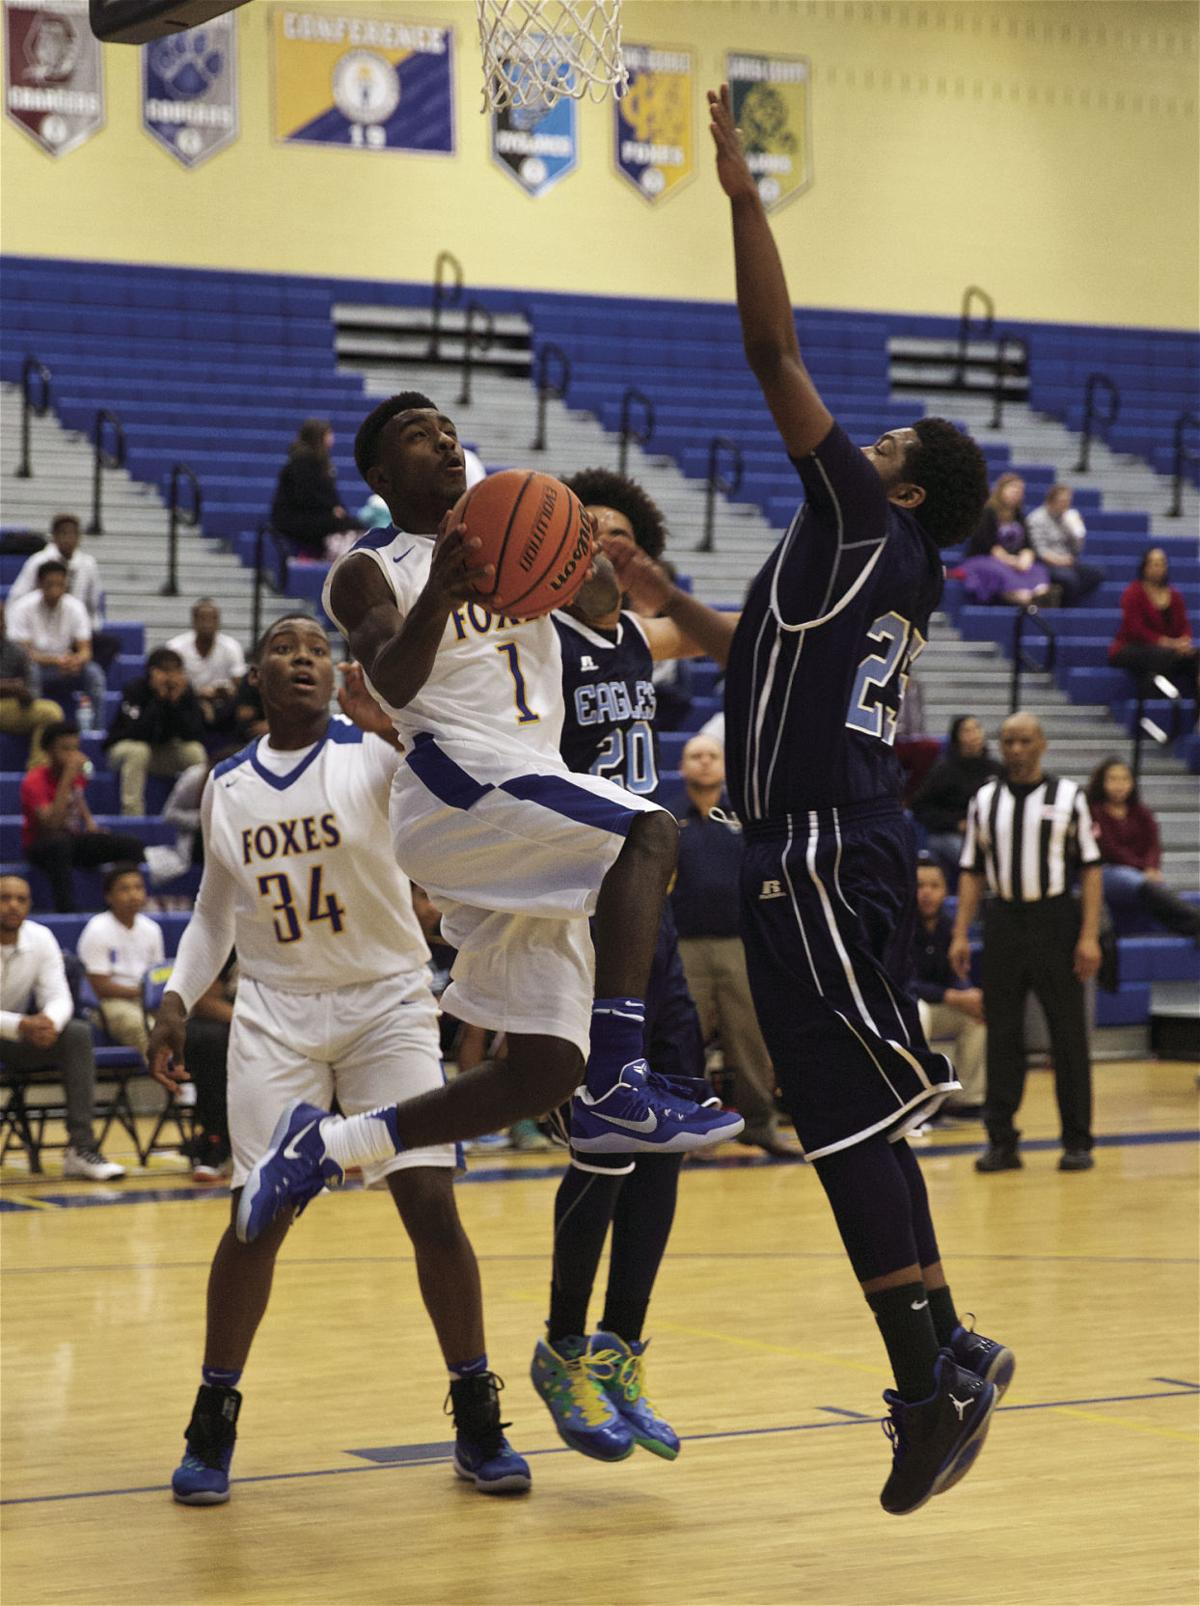 Washington & Lee at King George (Basketball)